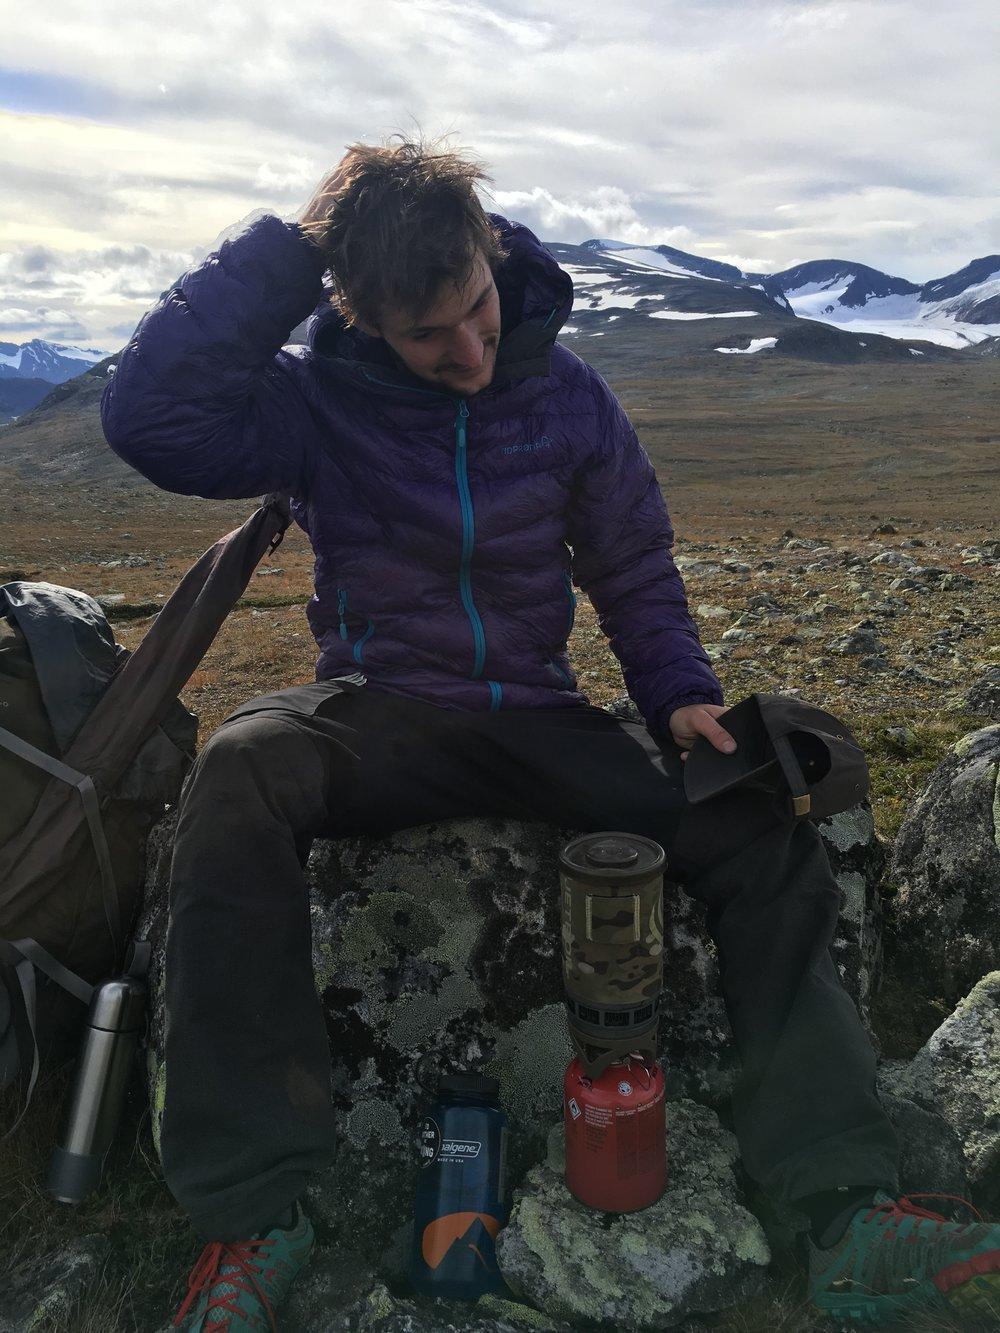 Jakken i brug under pause på fjeldet, vinter 2016  Foto: Jesper Hovkjær